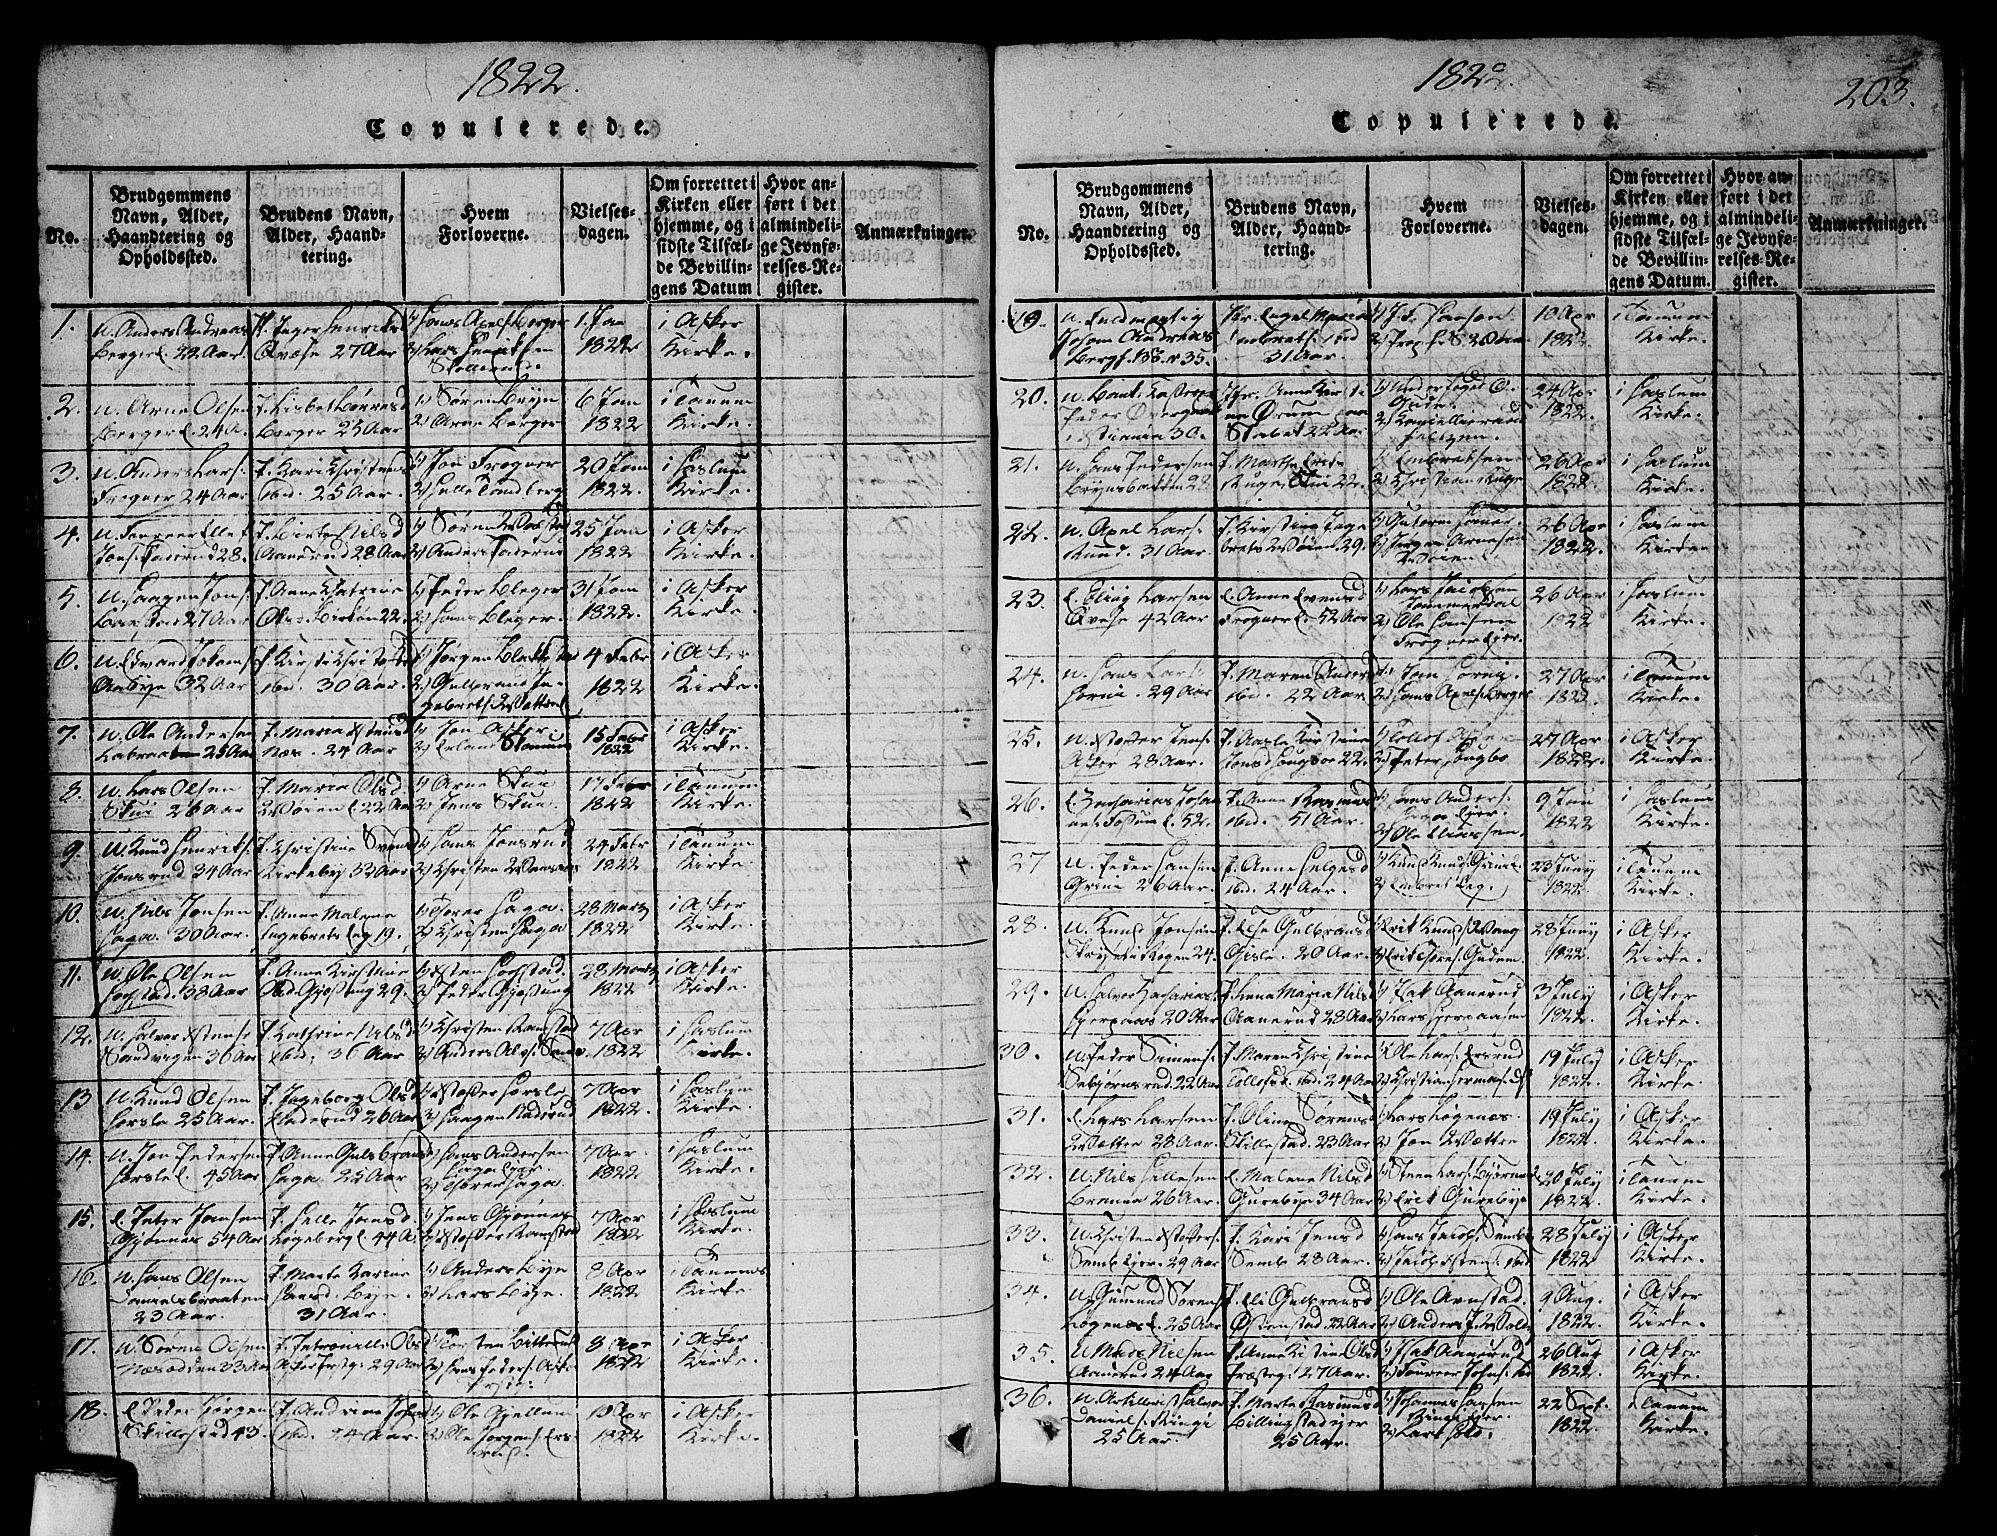 SAO, Asker prestekontor Kirkebøker, G/Ga/L0001: Klokkerbok nr. I 1, 1814-1830, s. 203